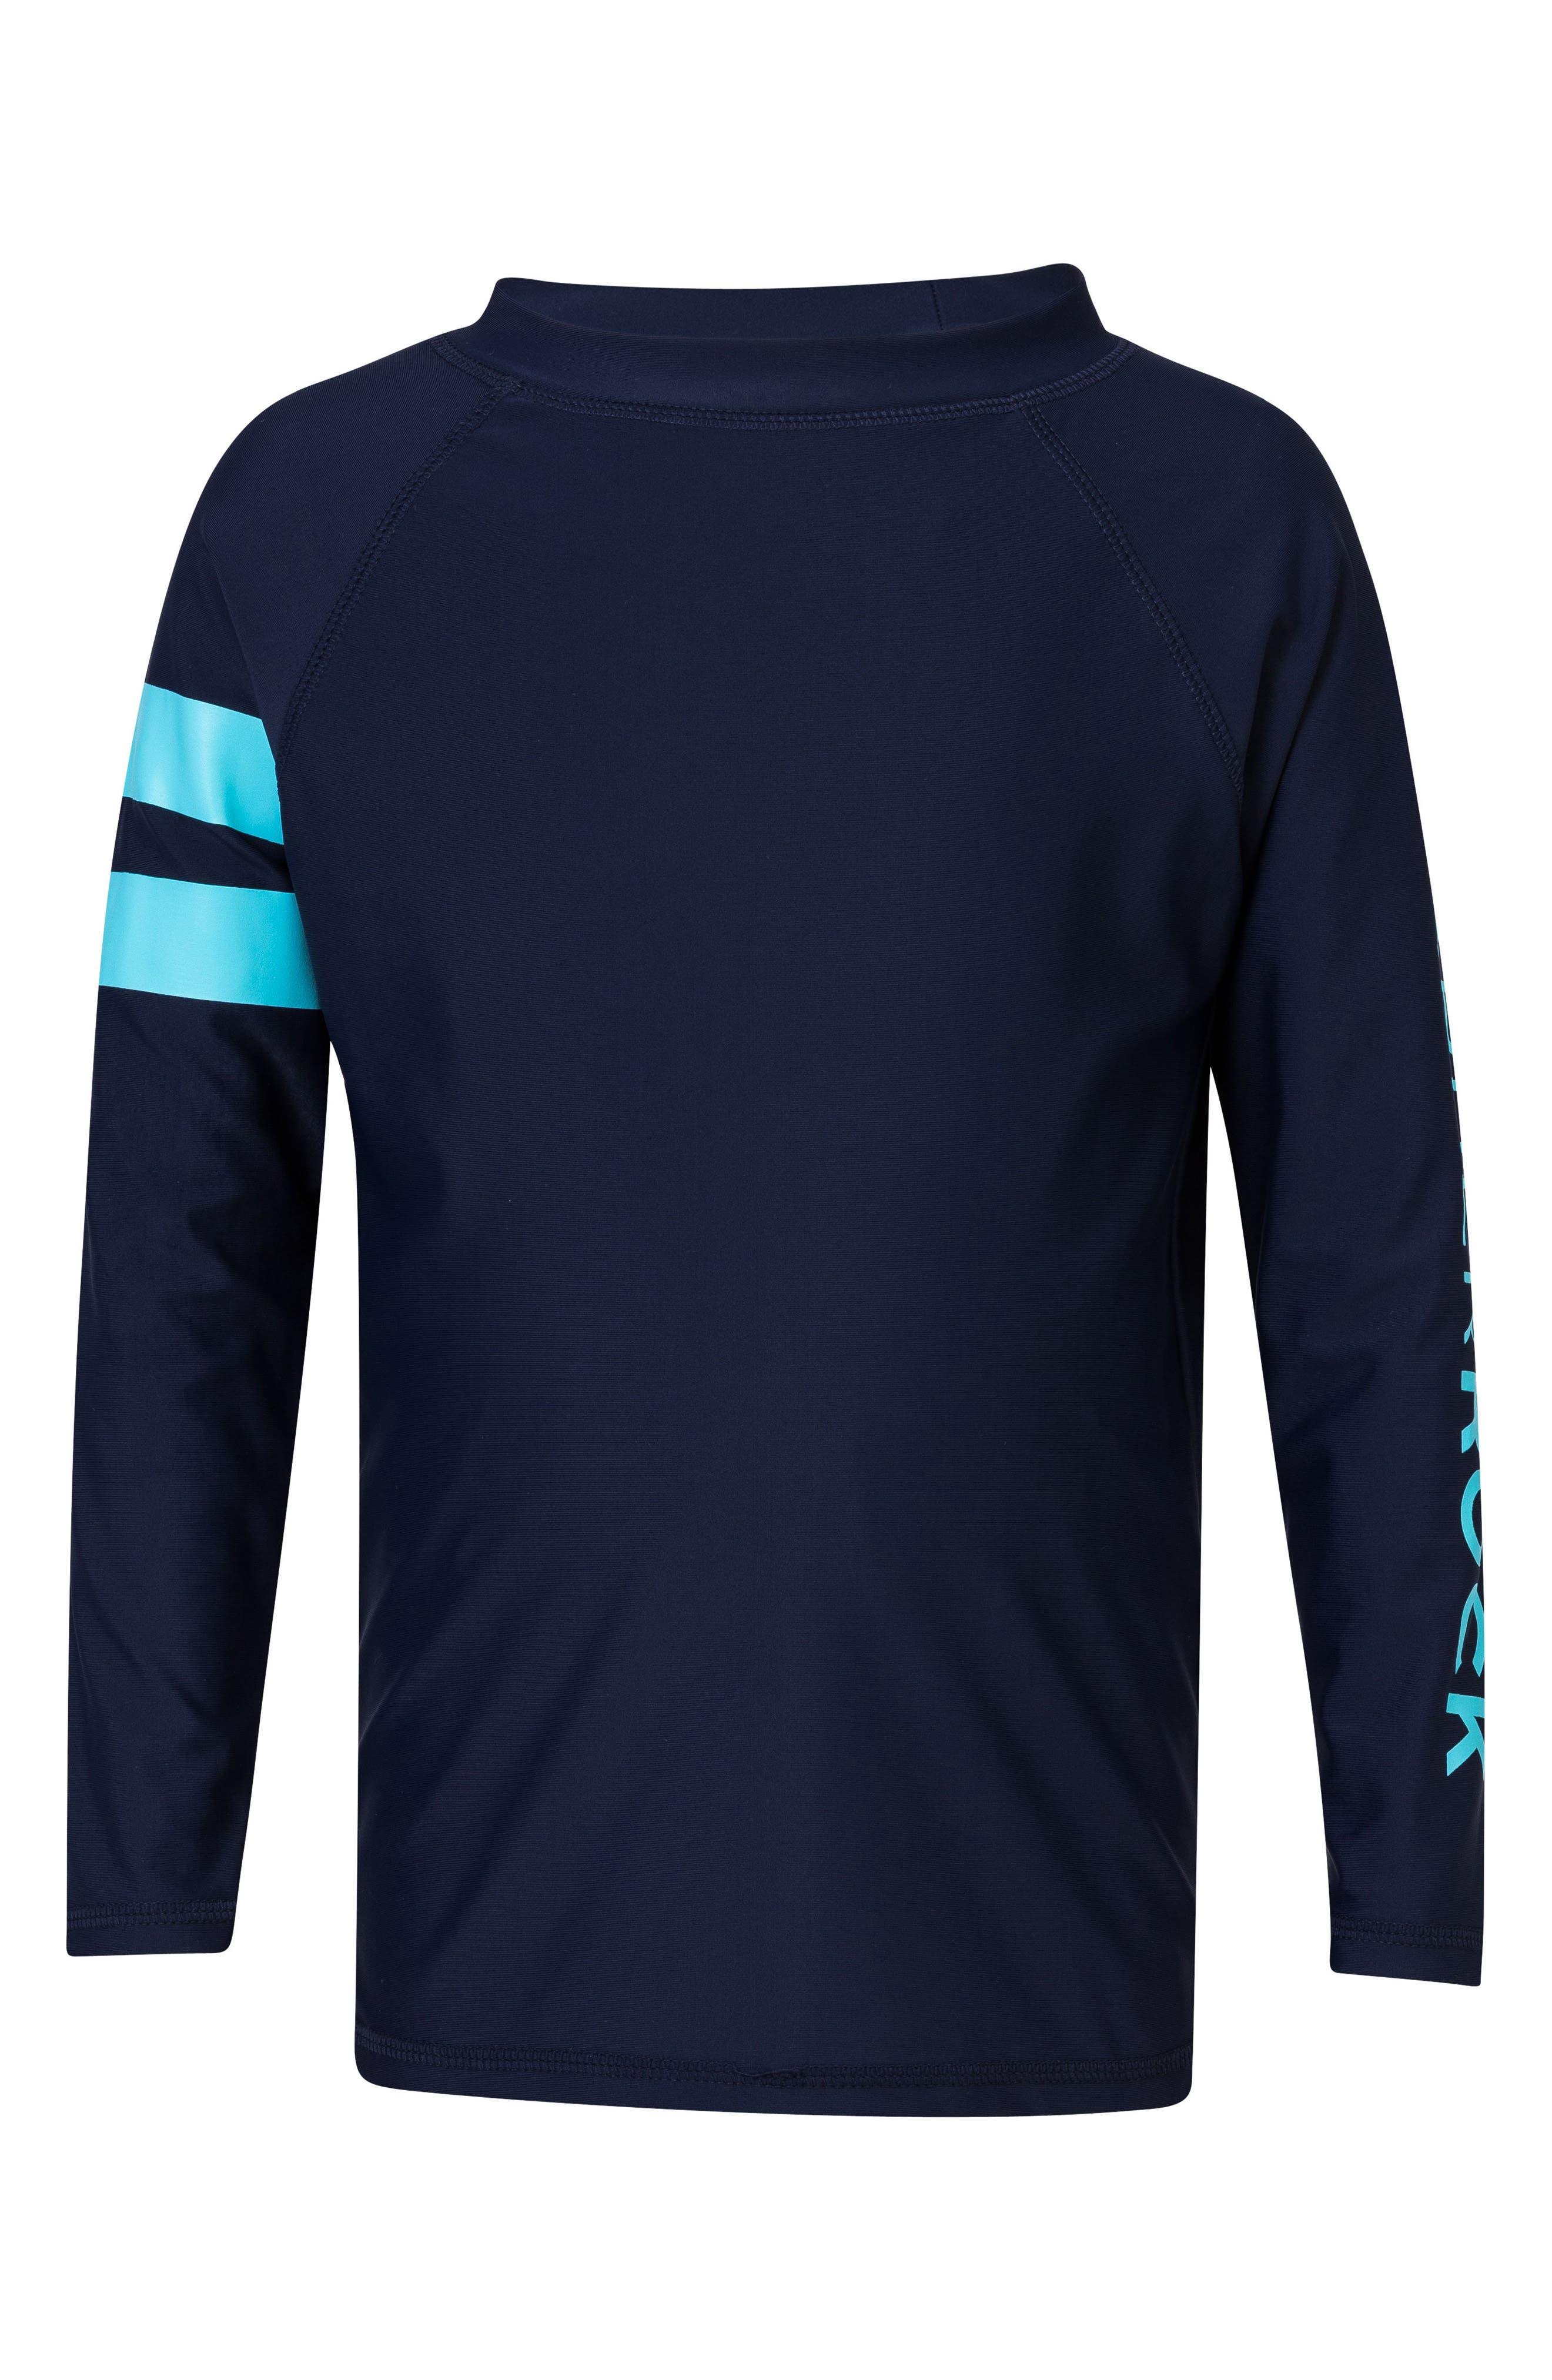 Raglan Long Sleeve Rashguard,                             Main thumbnail 1, color,                             Navy/ Light Blue Stripe